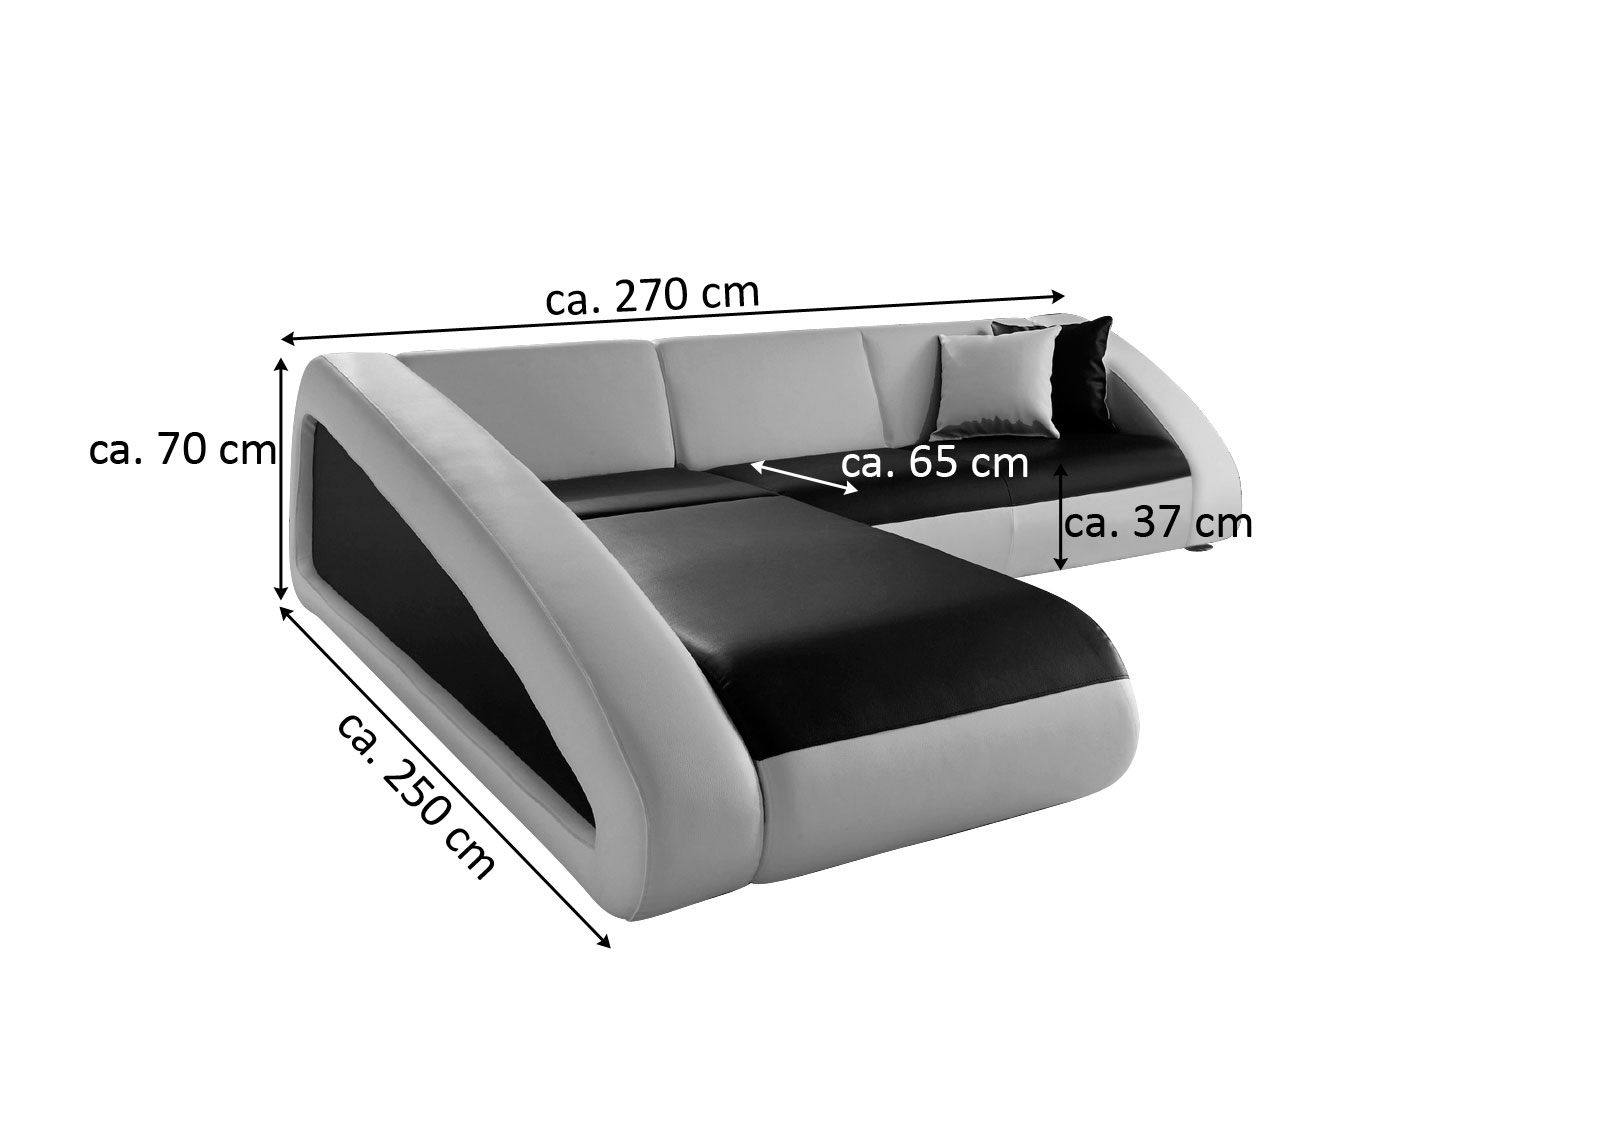 Sam couch ecksofa polsterecke 250 x 270 cm braun creme ciao for Ecksofa 250 cm breit